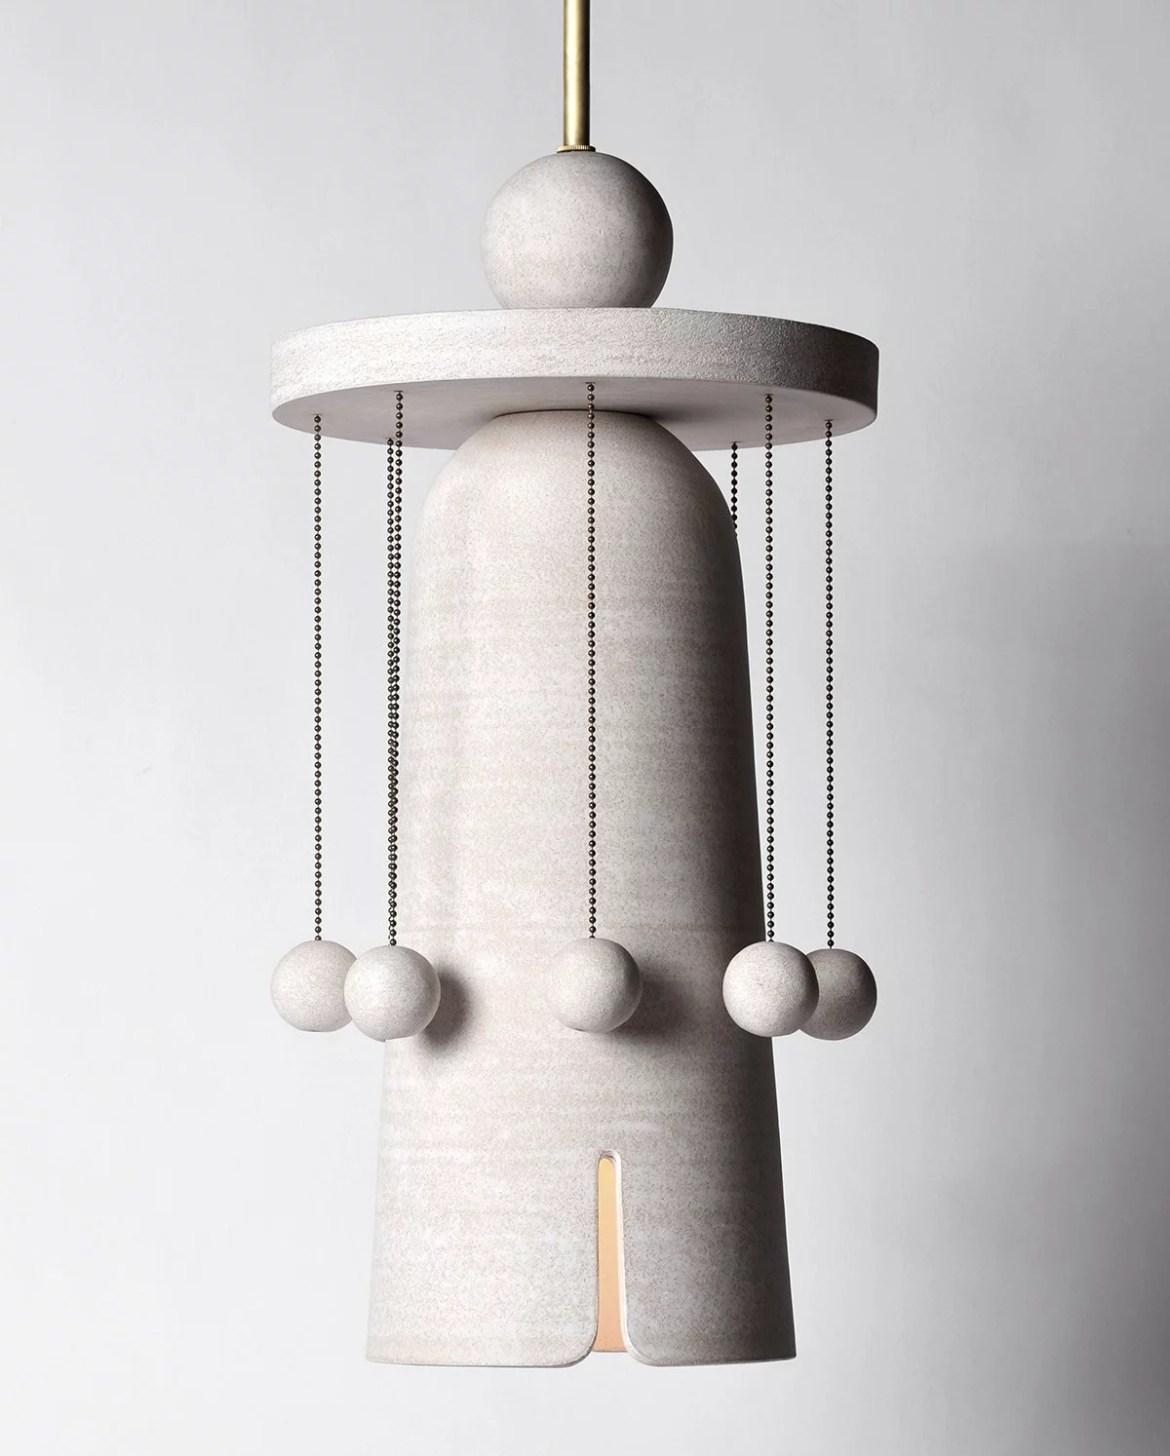 Design, Eric Roinestad, American Designers Hot List 2017, Part III pour Sight Unseen